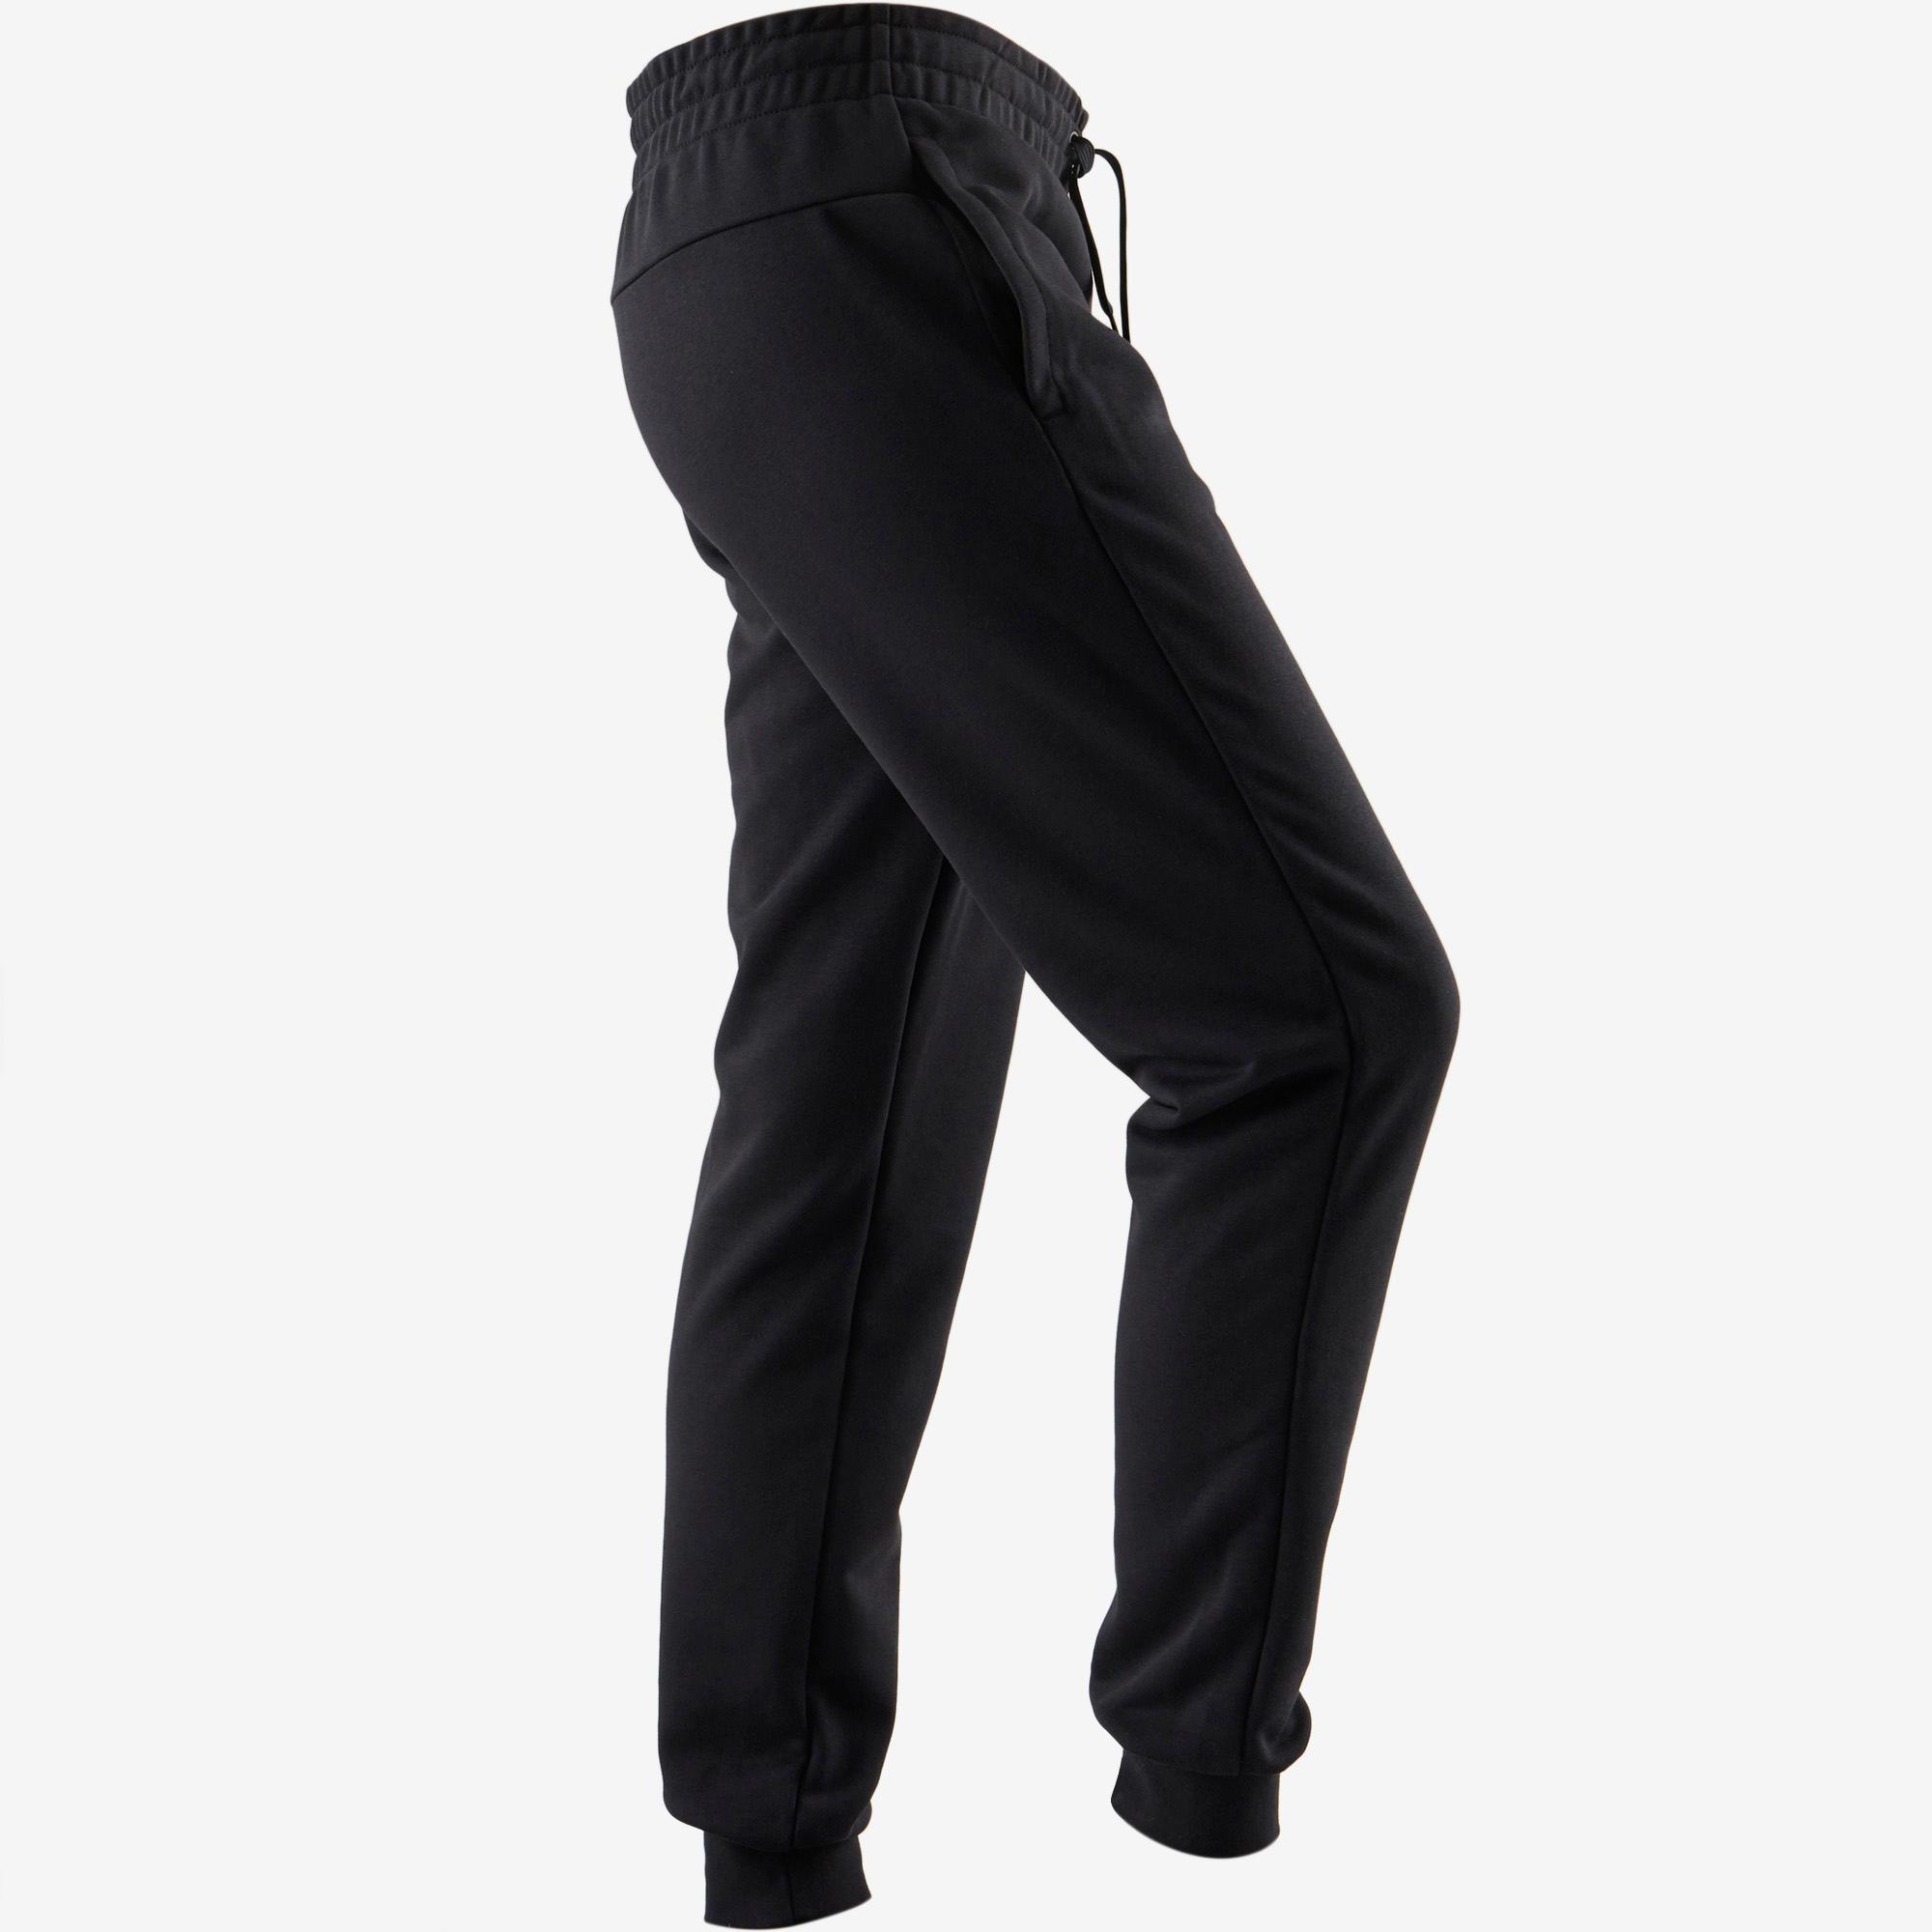 Adidas Noirblanc 500 Linear Pantalon Gym Femme Pilates Douce